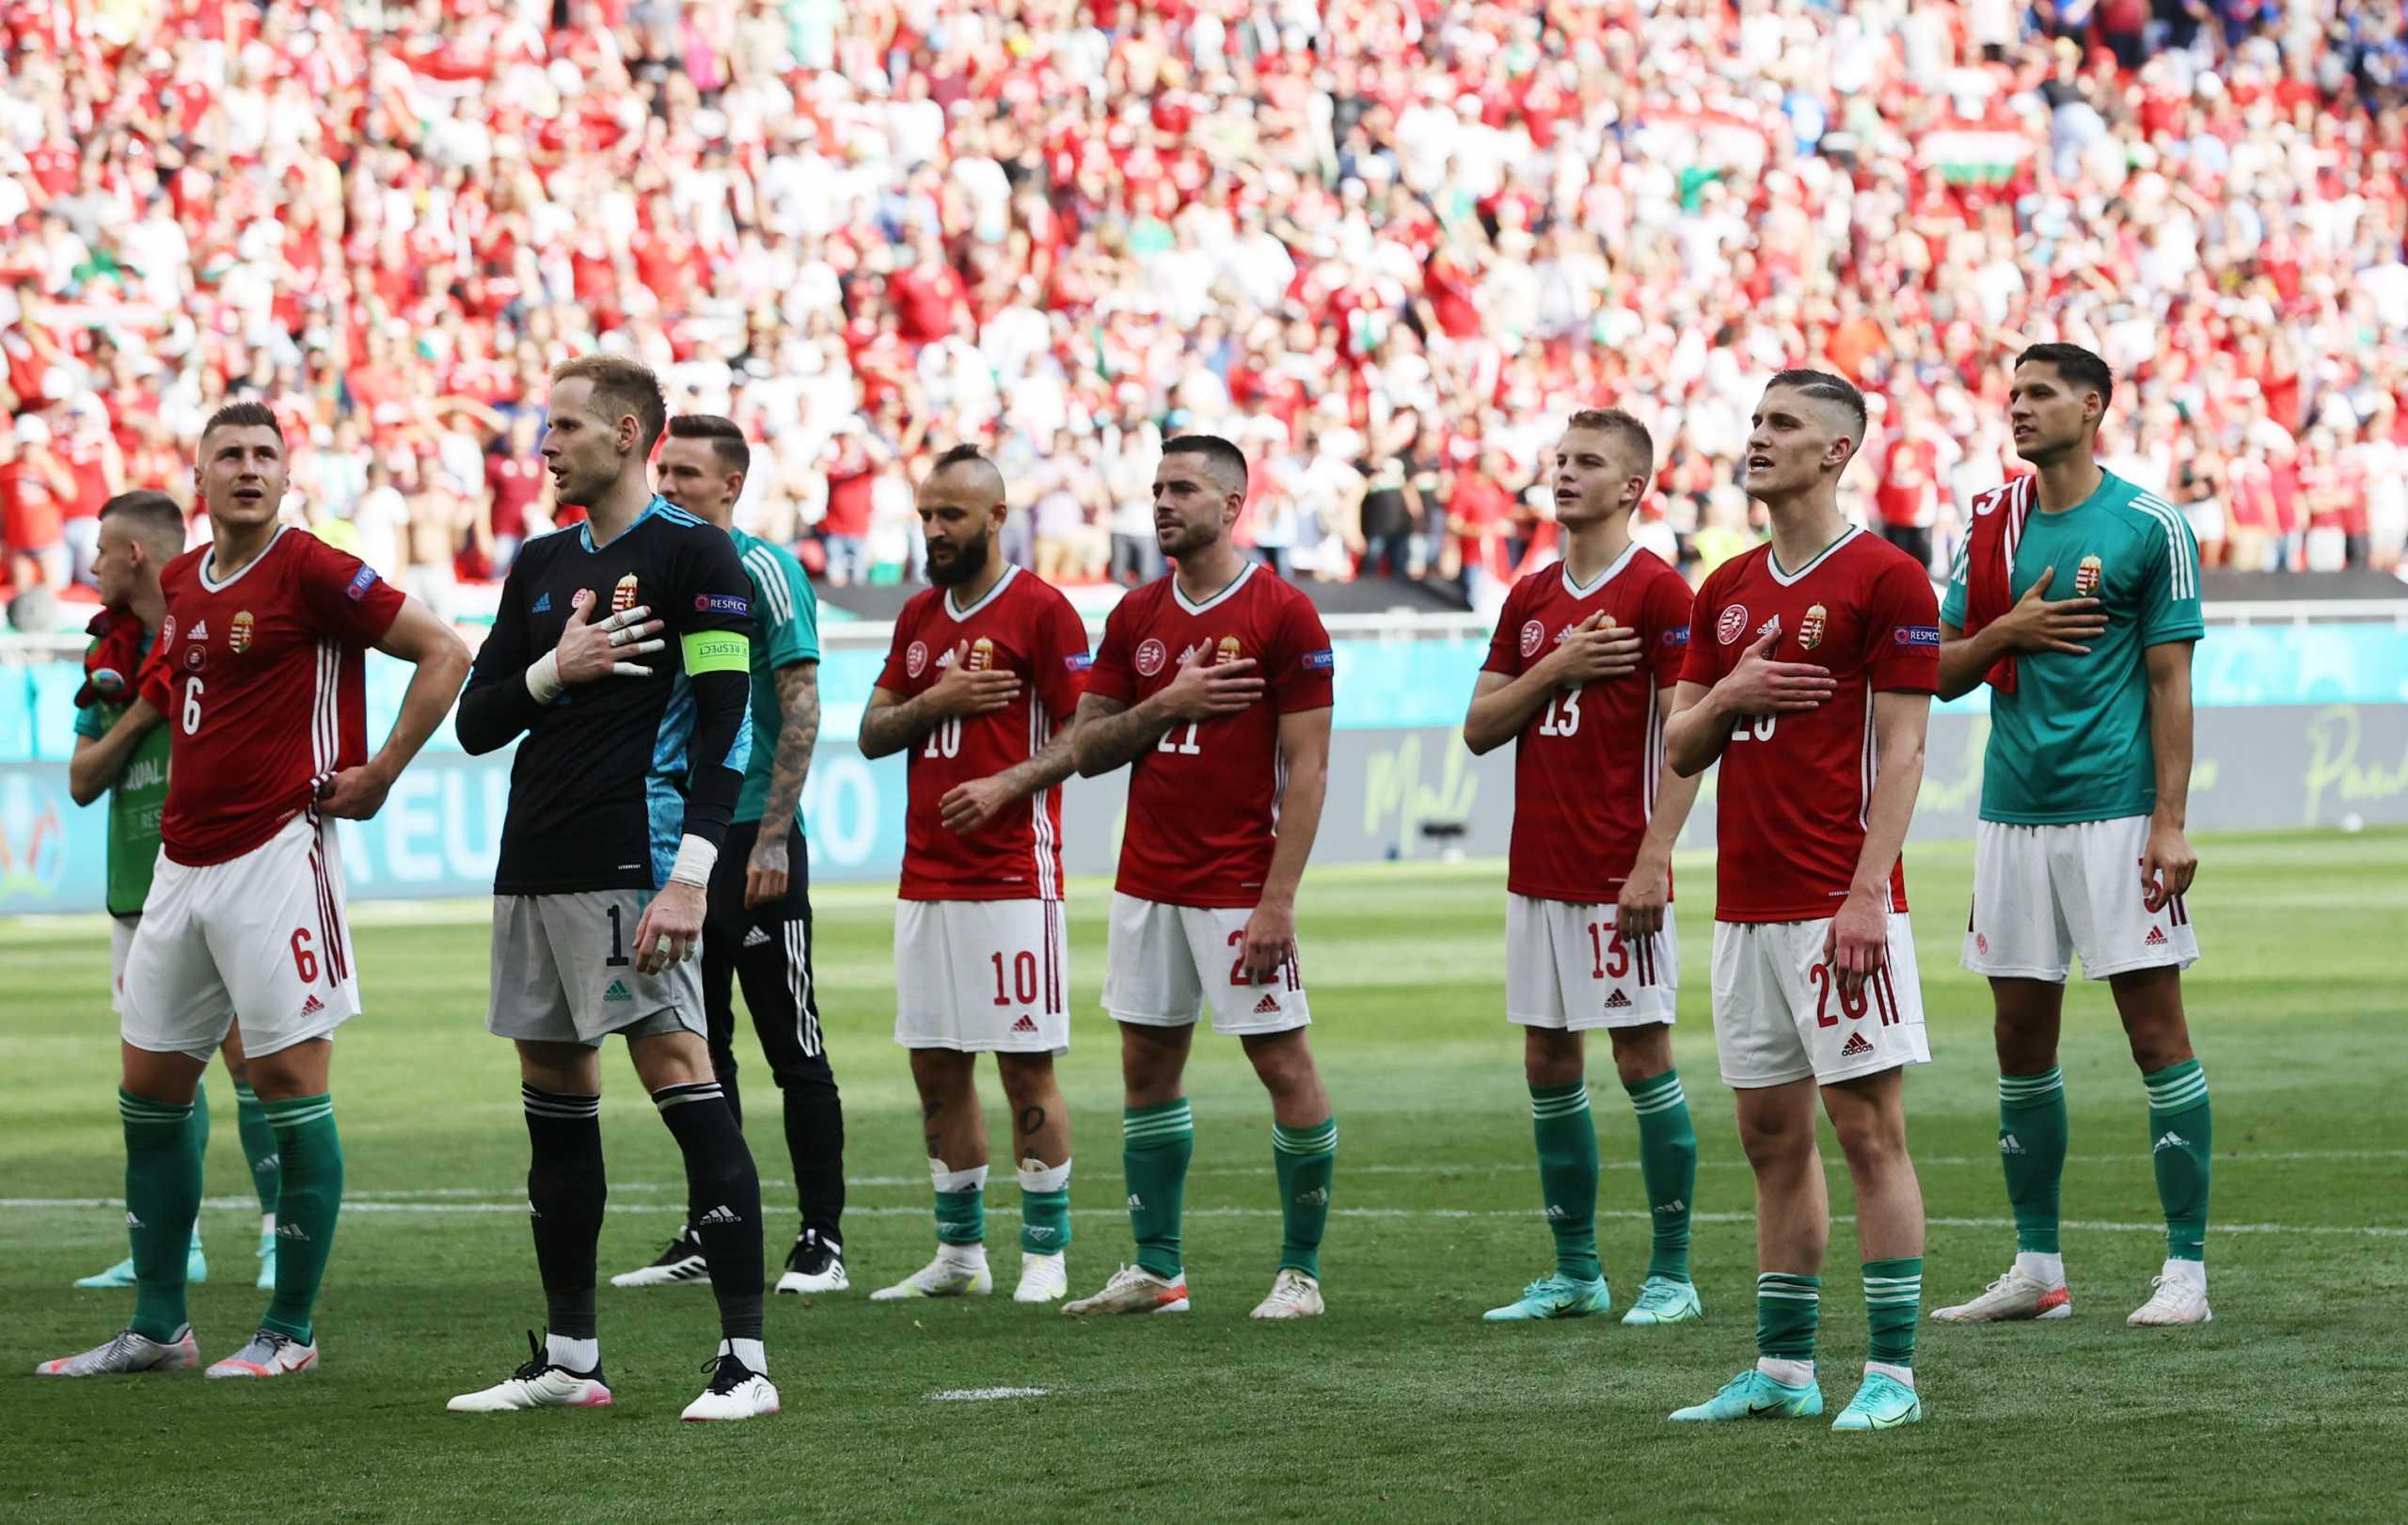 Euro 2020: Αποθέωση και «πανηγύρι» στην Ουγγαρία για την ισοπαλία